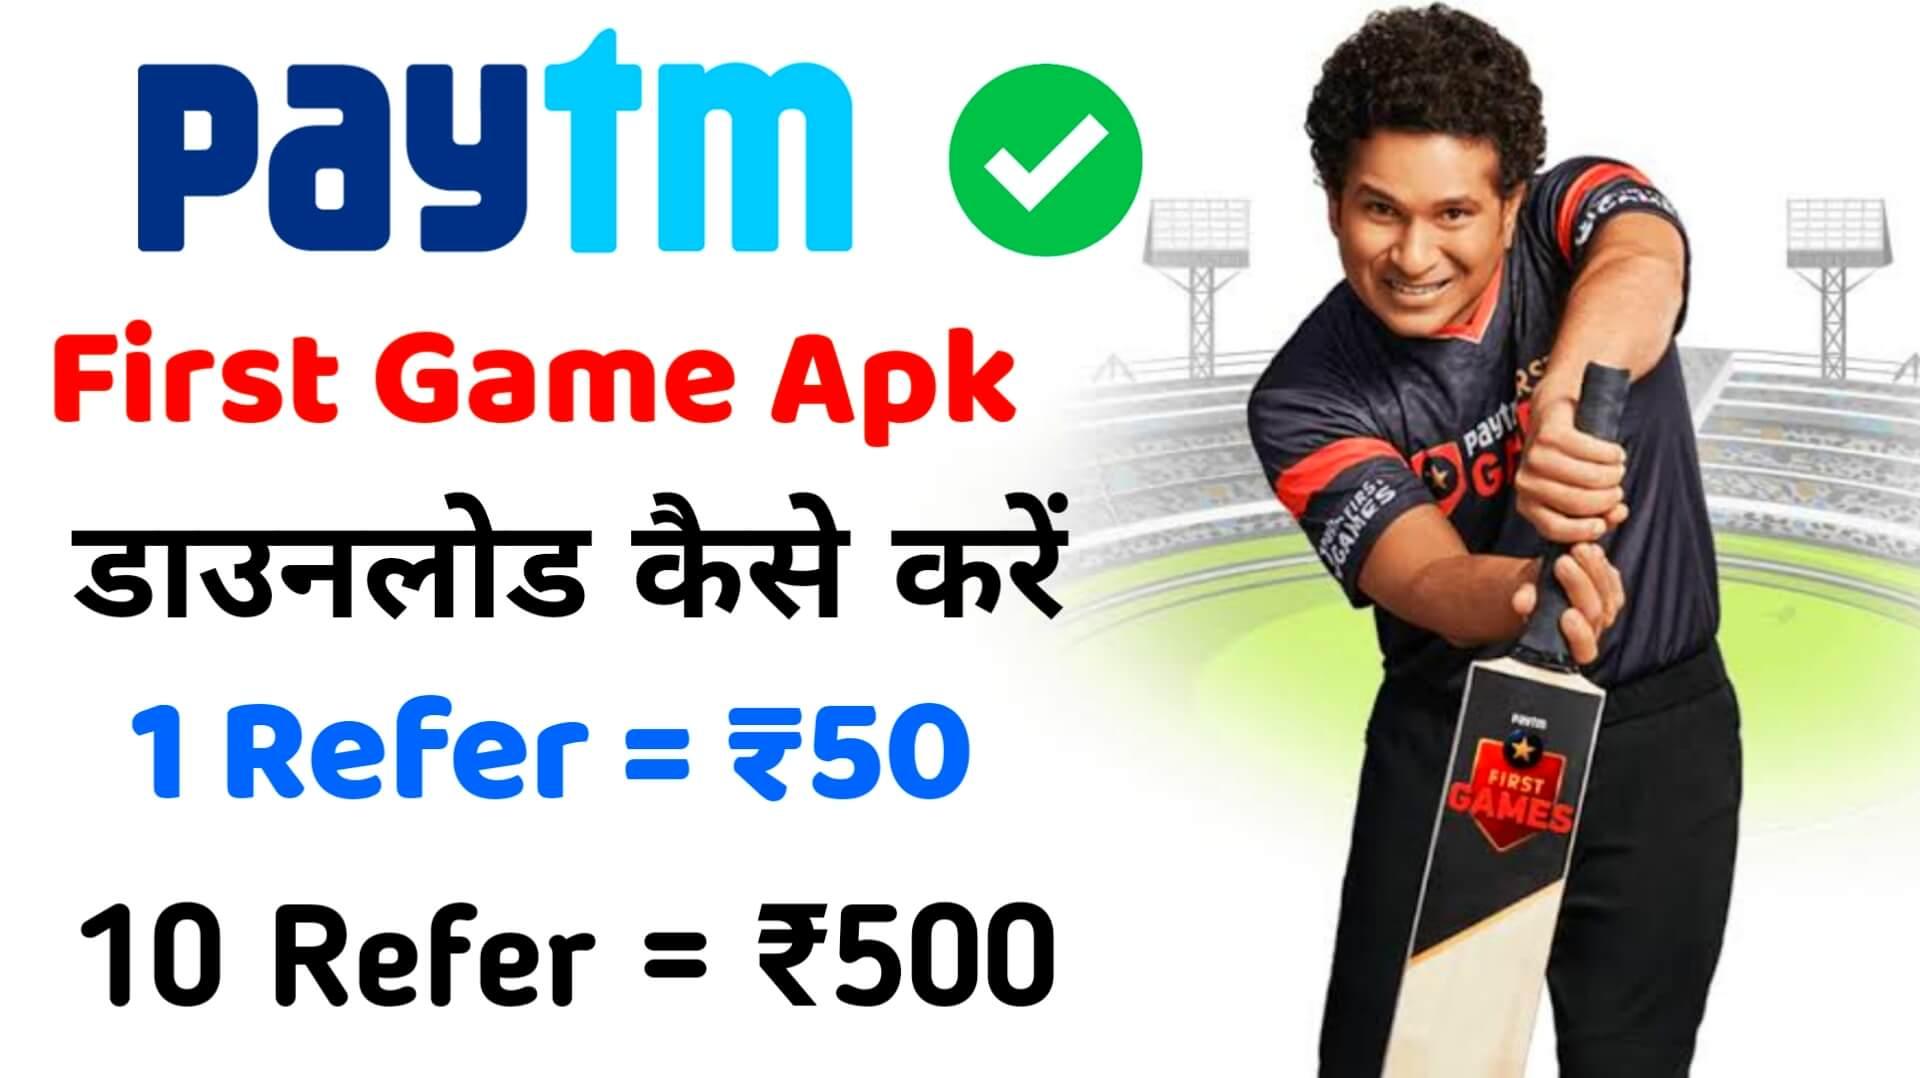 paytm first games apk download